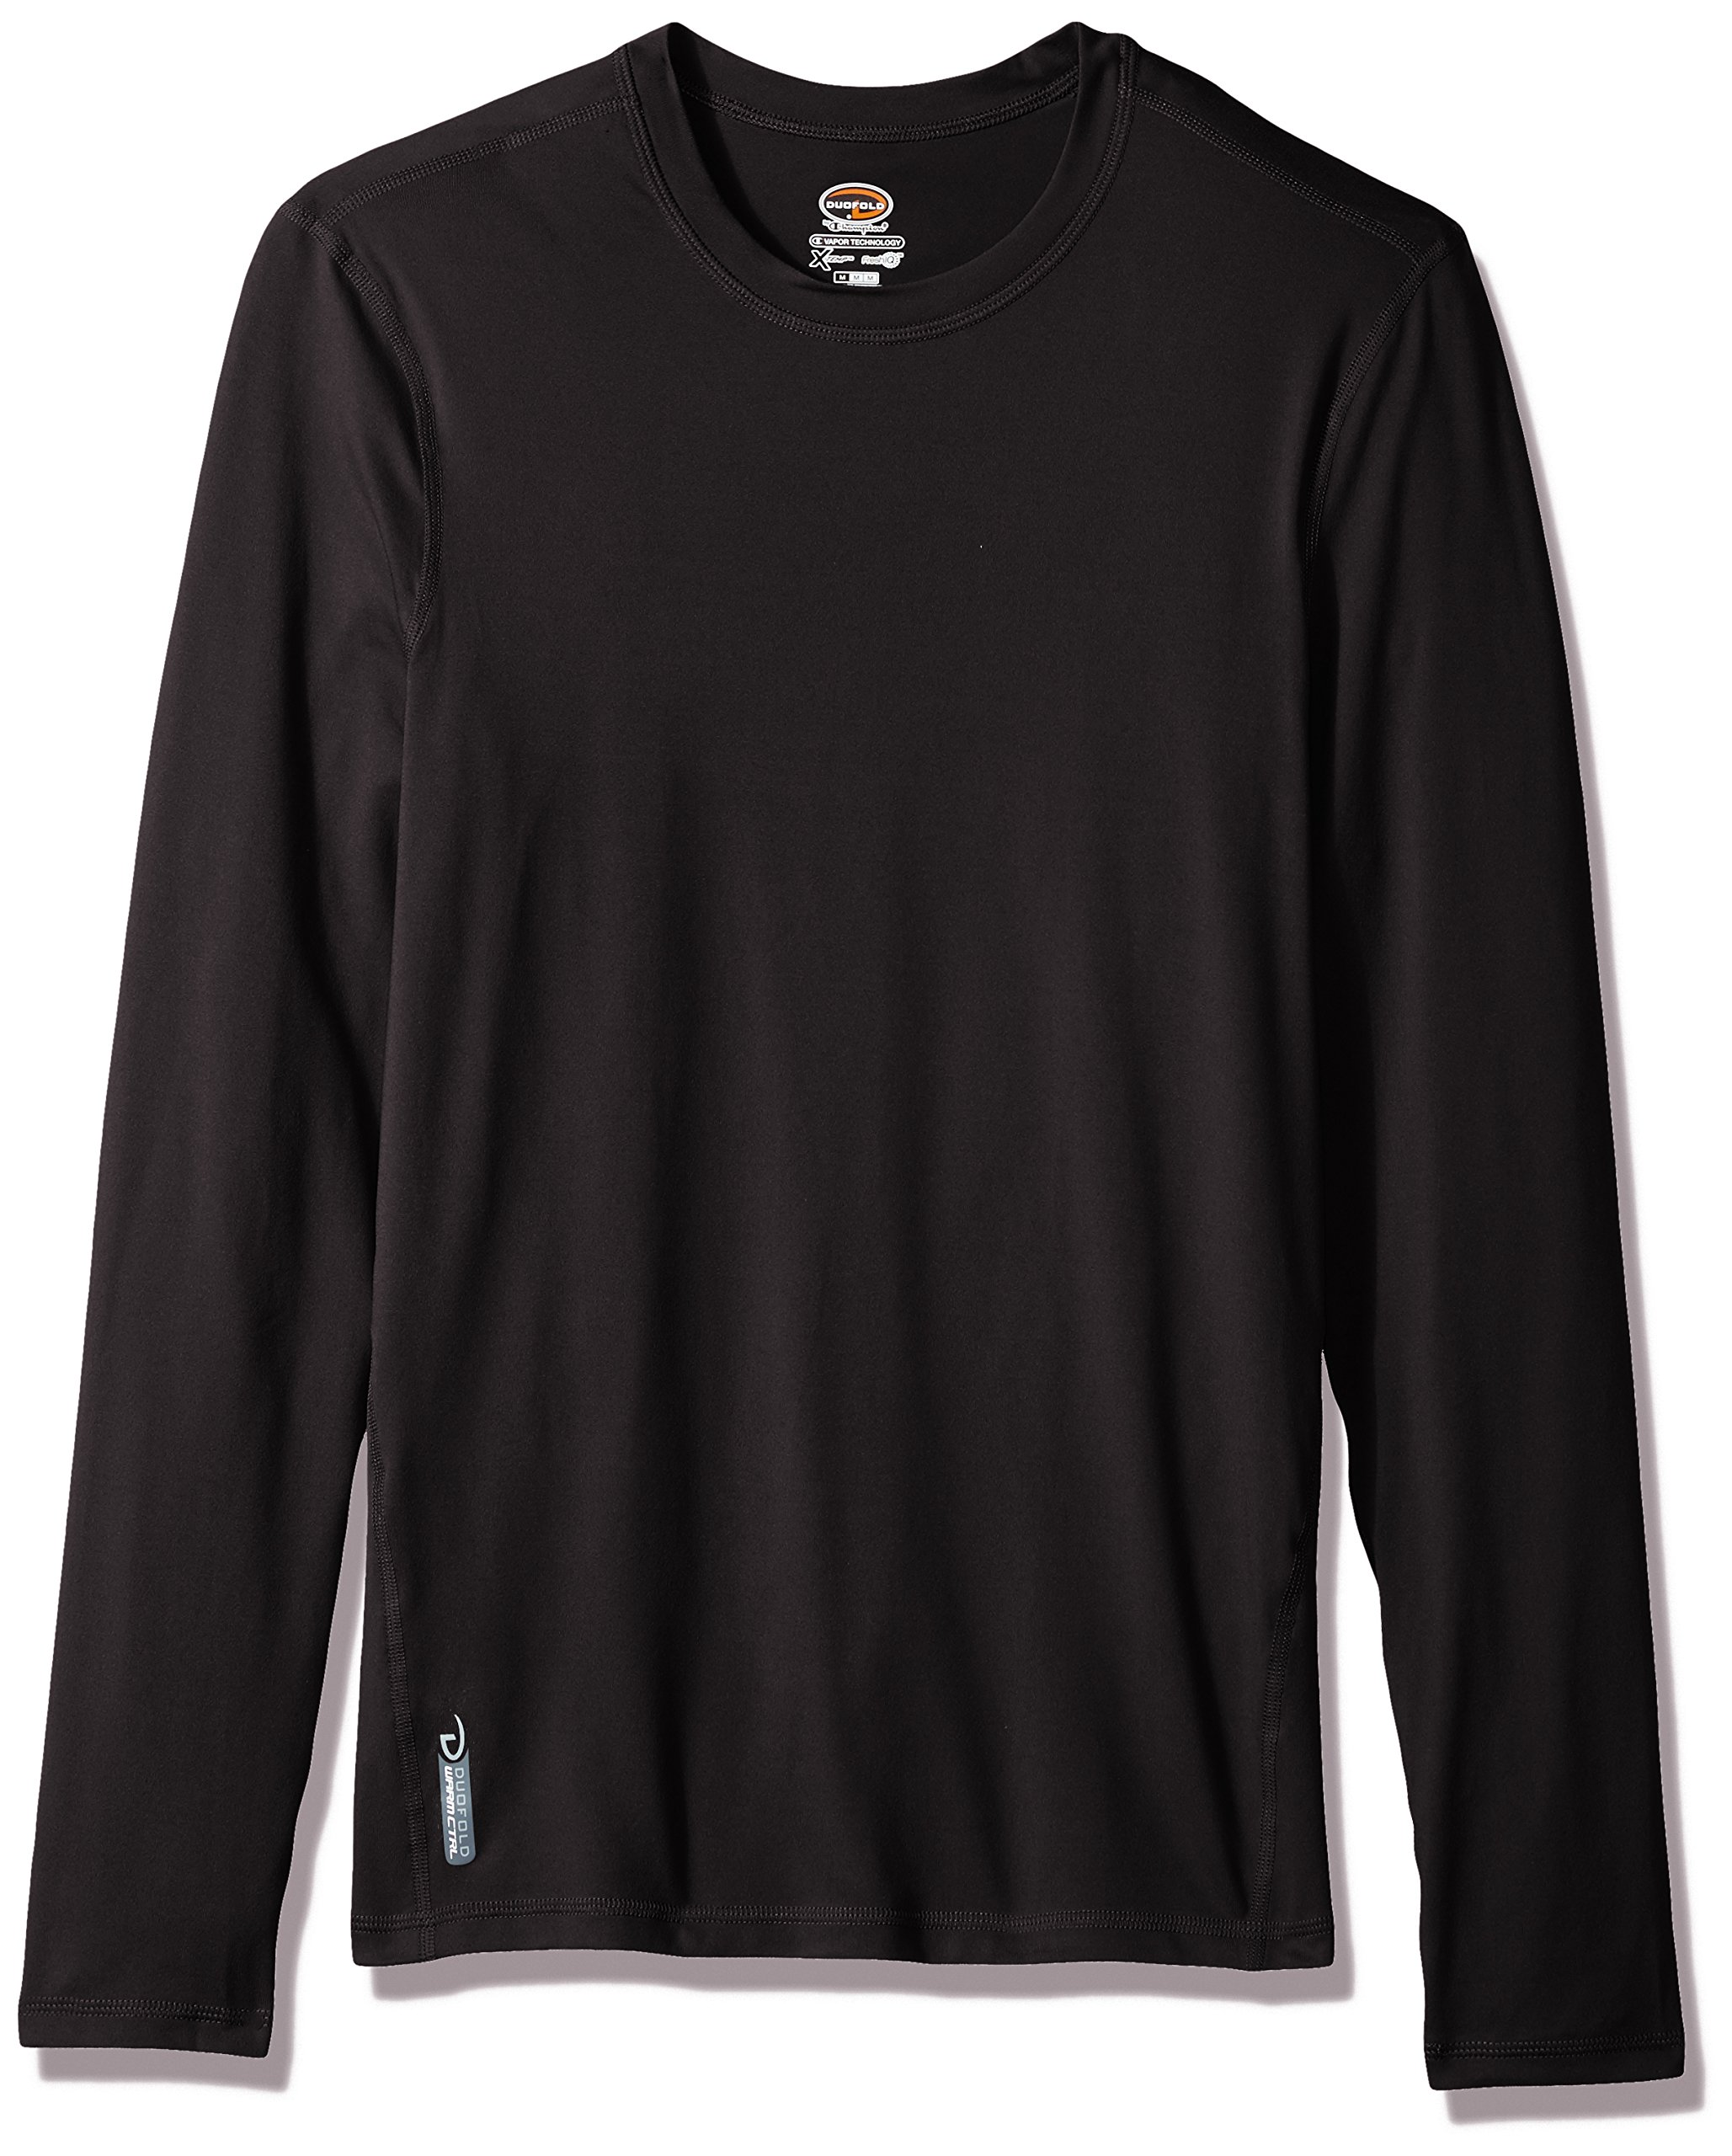 Duofold Men's Flex Weight Thermal Shirt, Black, Medium by Duofold